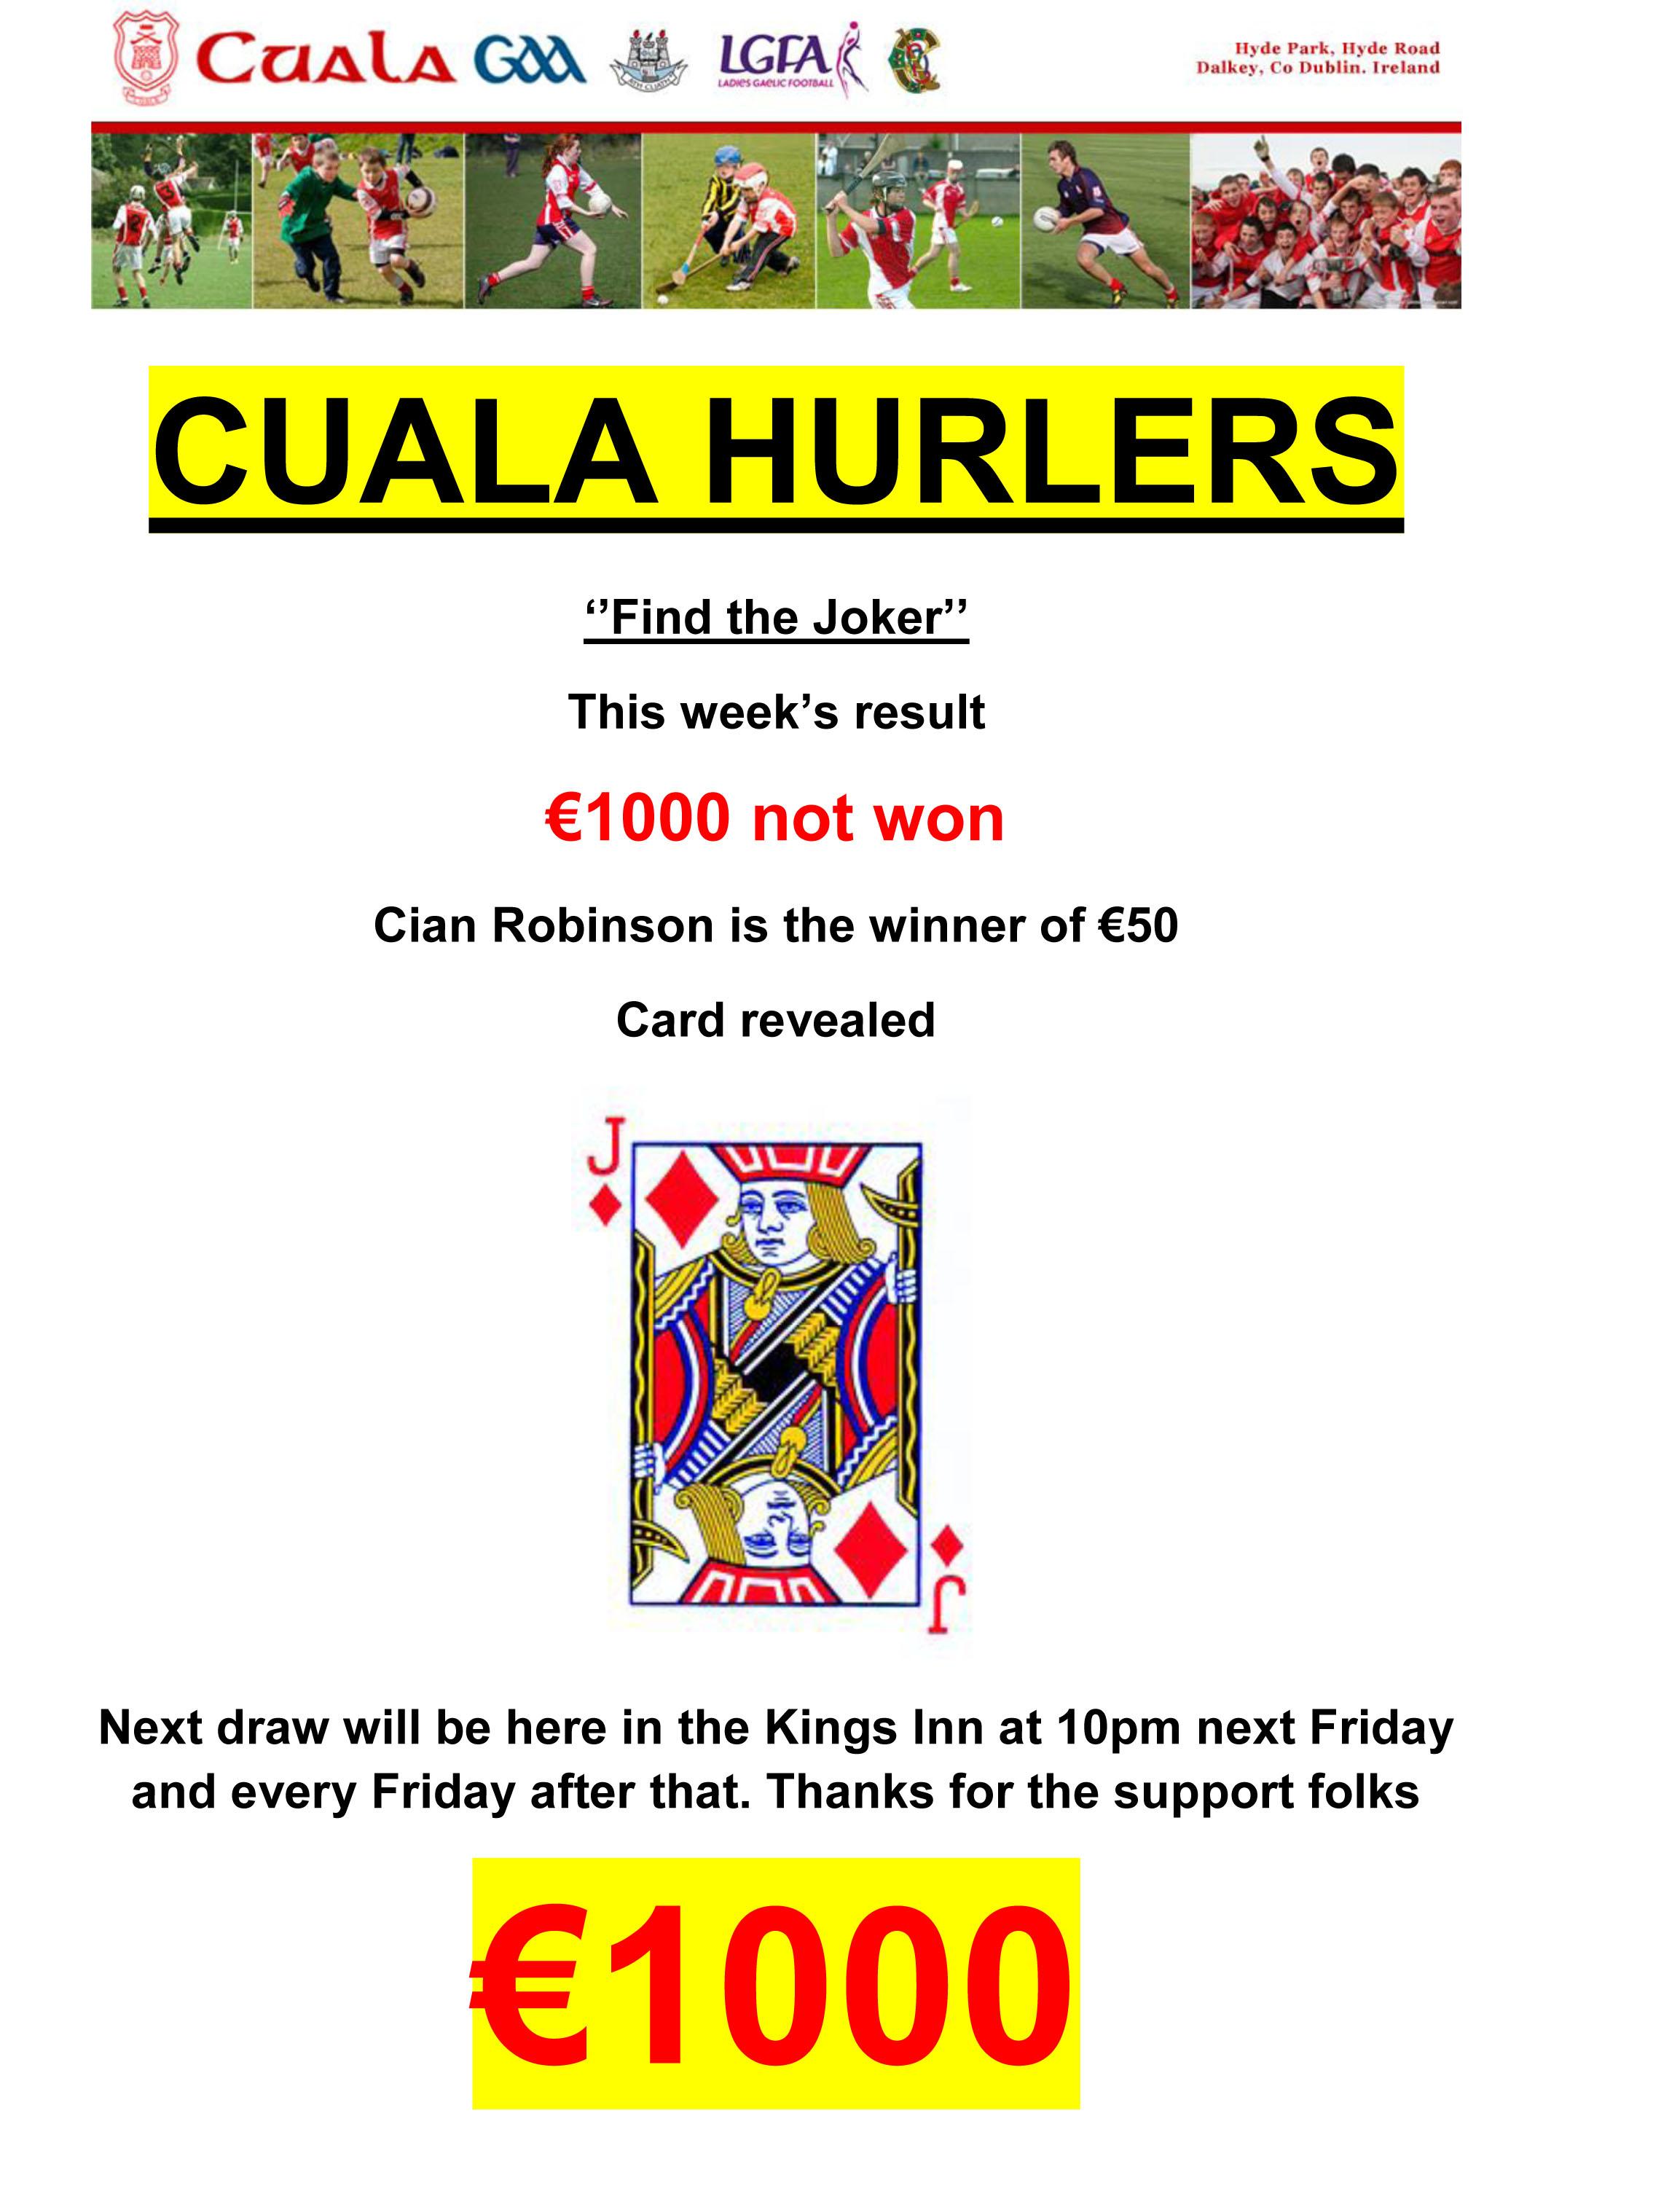 CUALA HURLERS RESULT JOKER